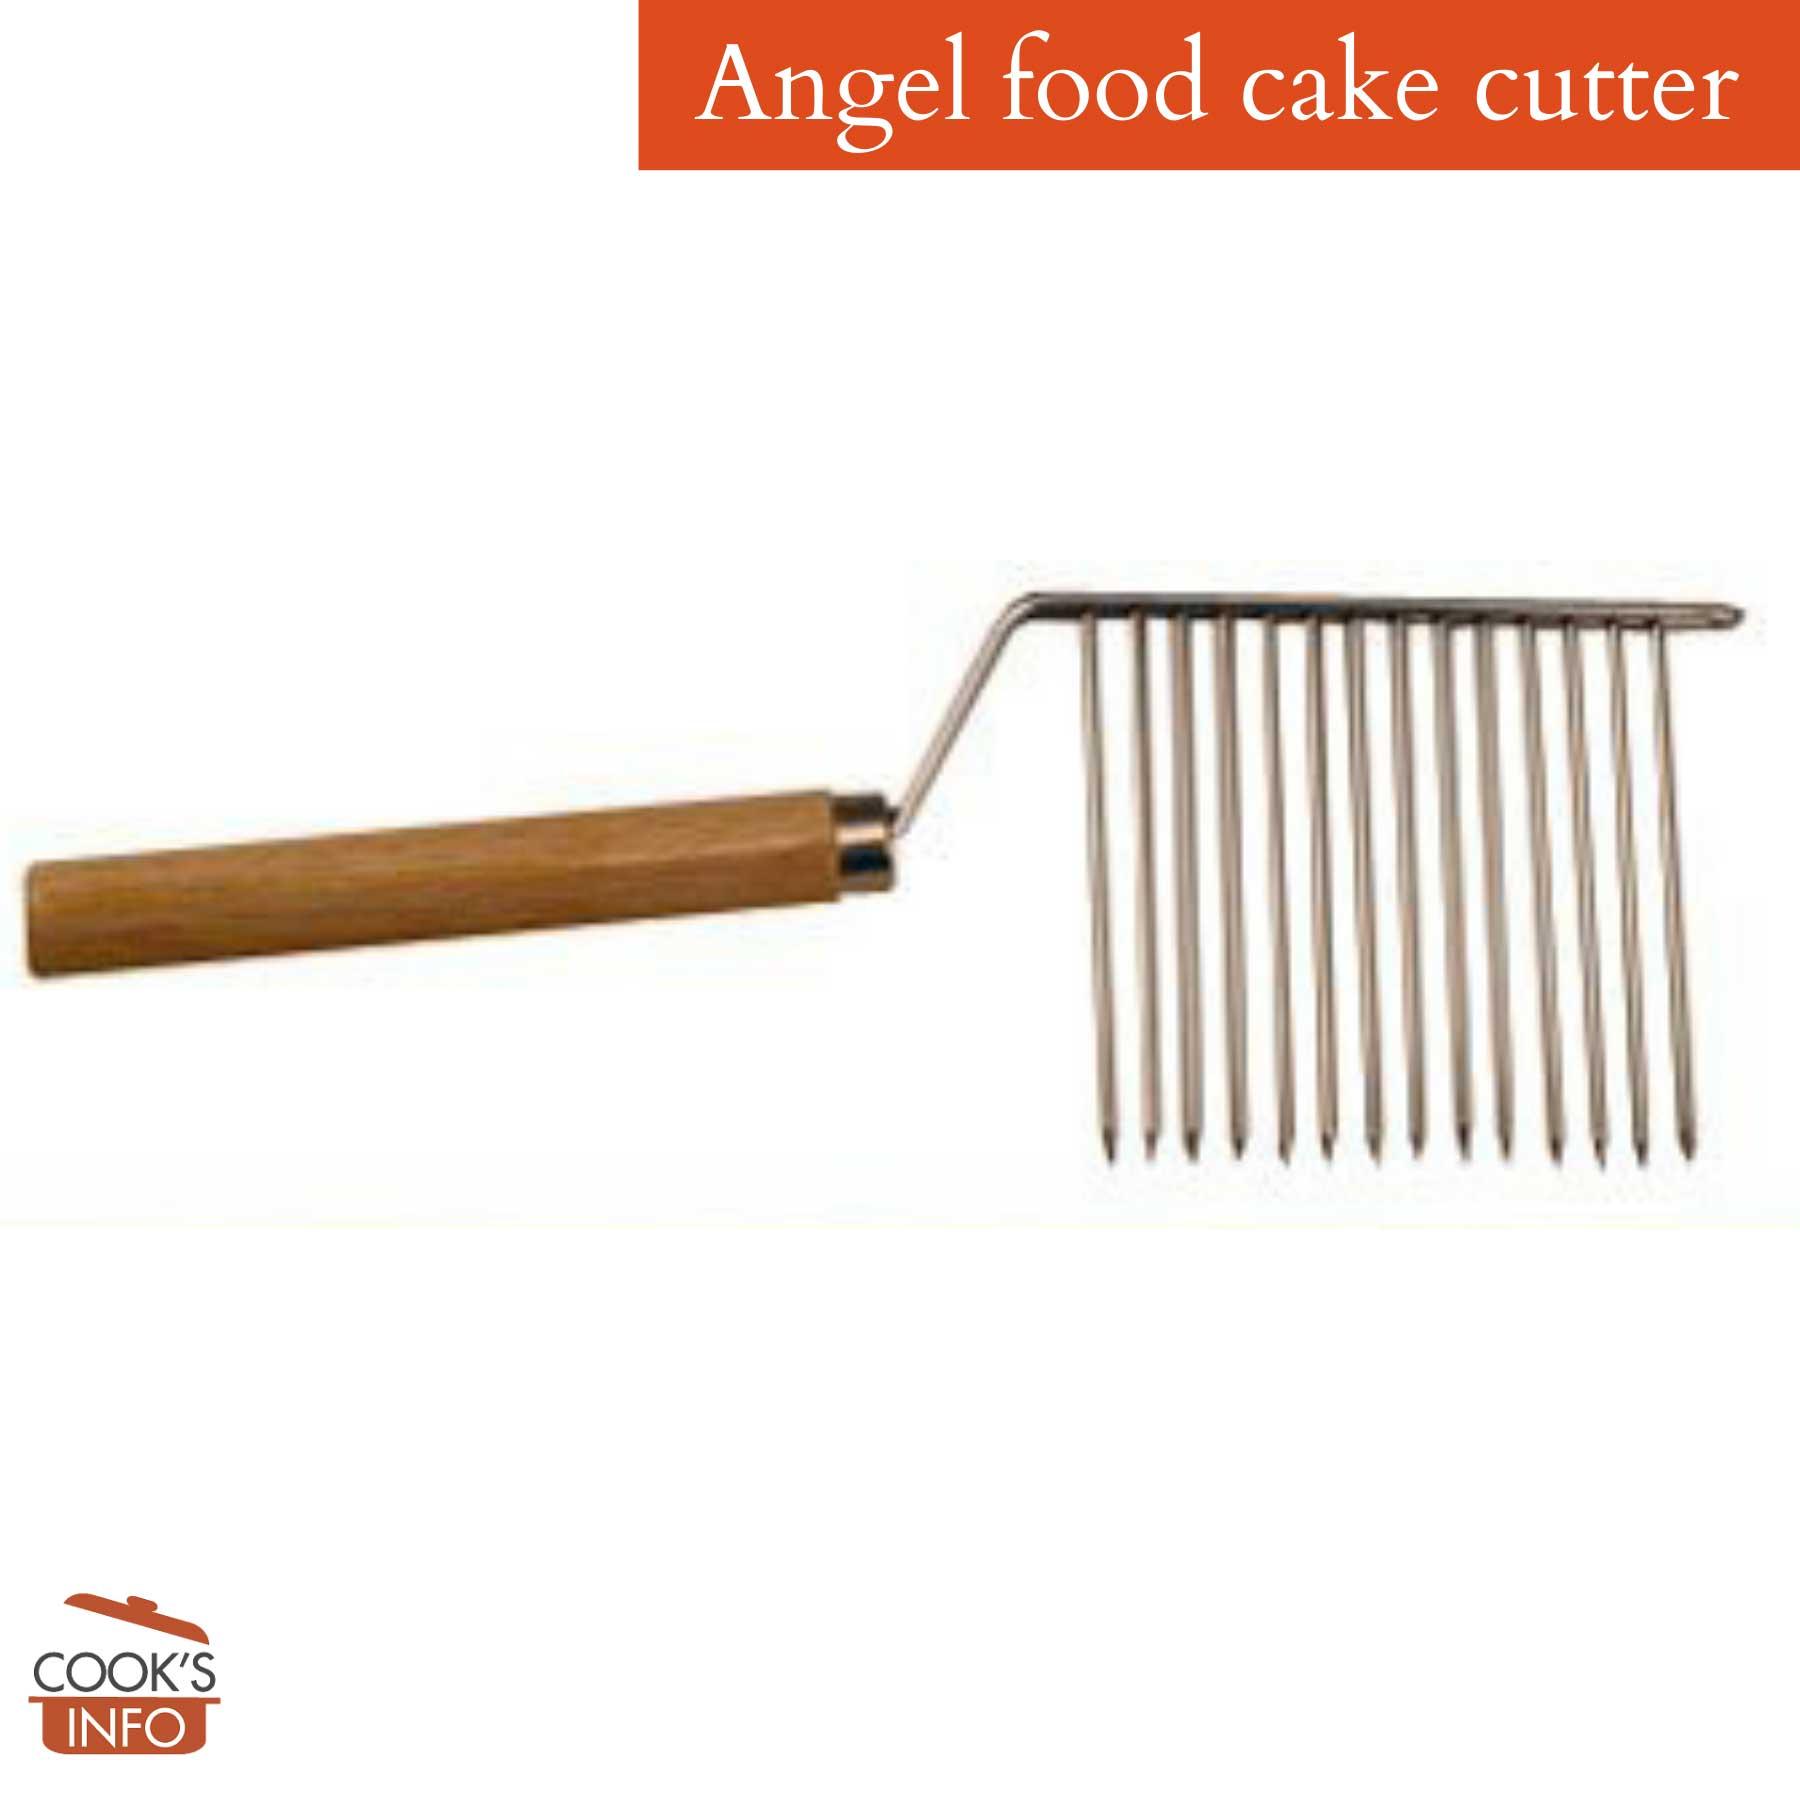 Angel food cake cutter